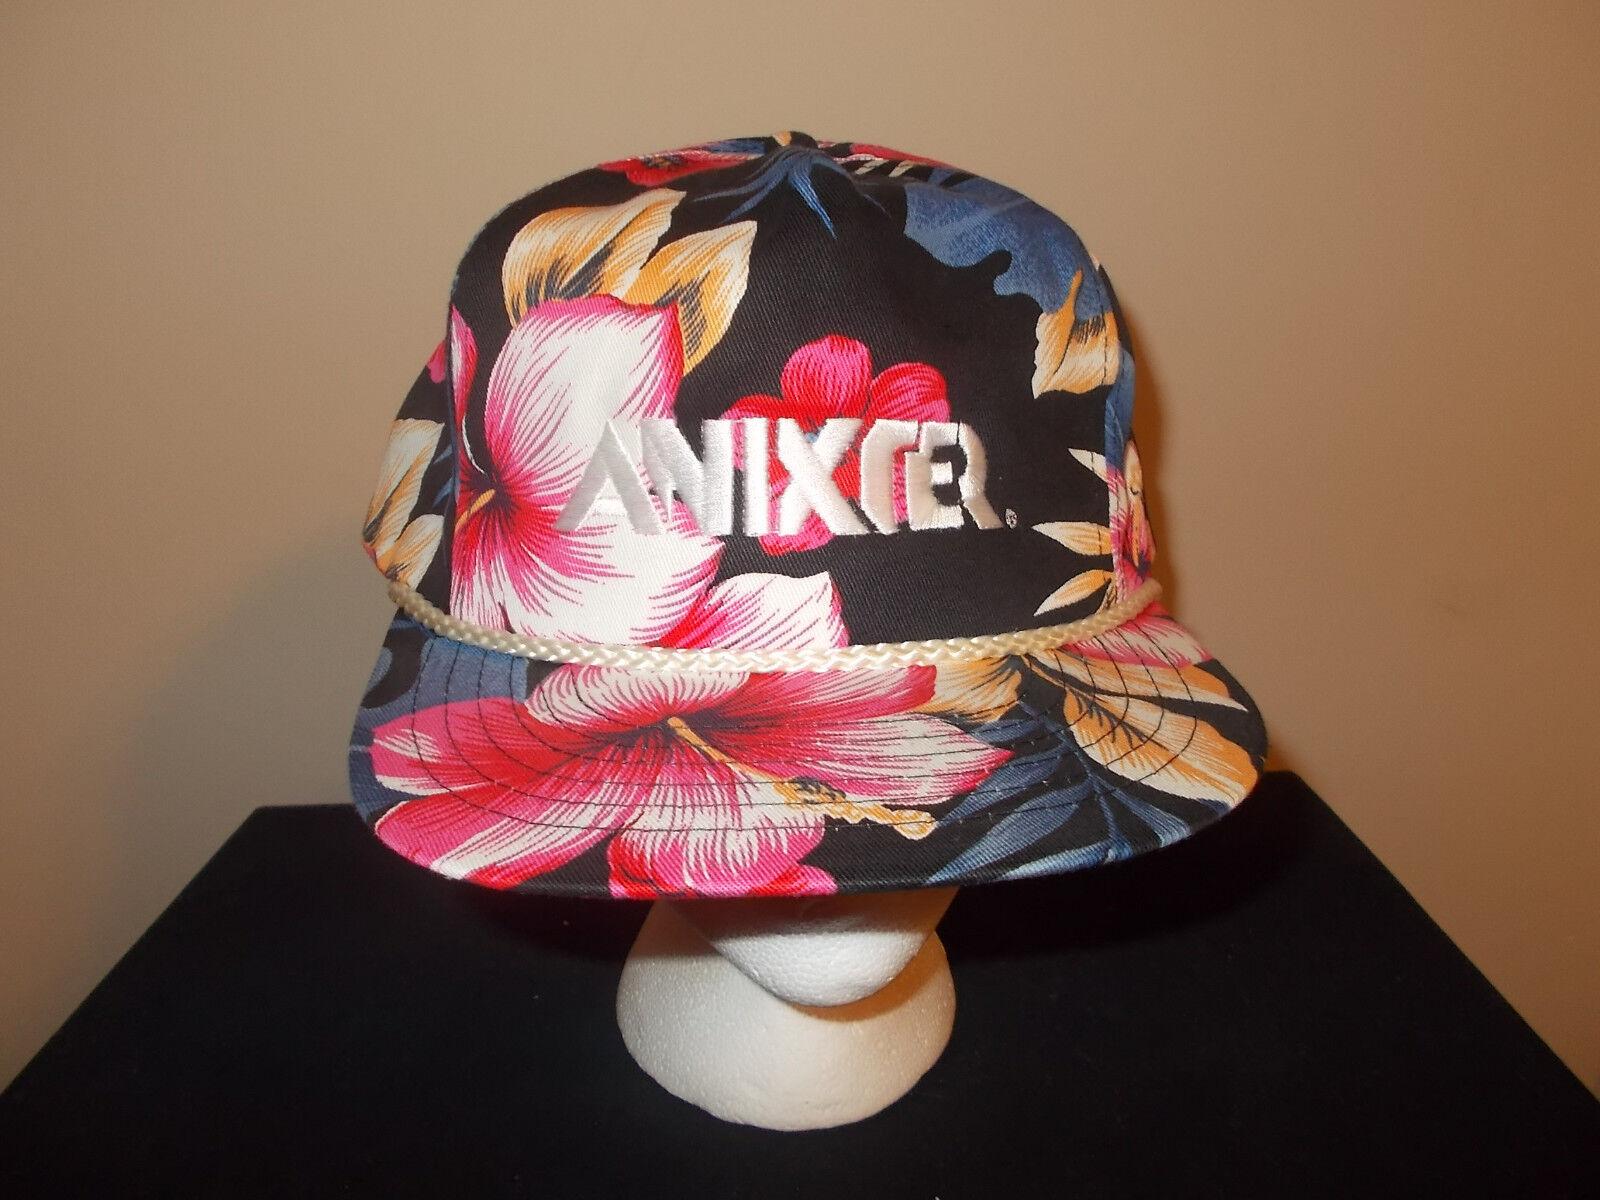 VTG-1990s Anixter supreme Hawaiian Flower Pattern Fresh Prince supreme Anixter style hat sku1 18ed4d